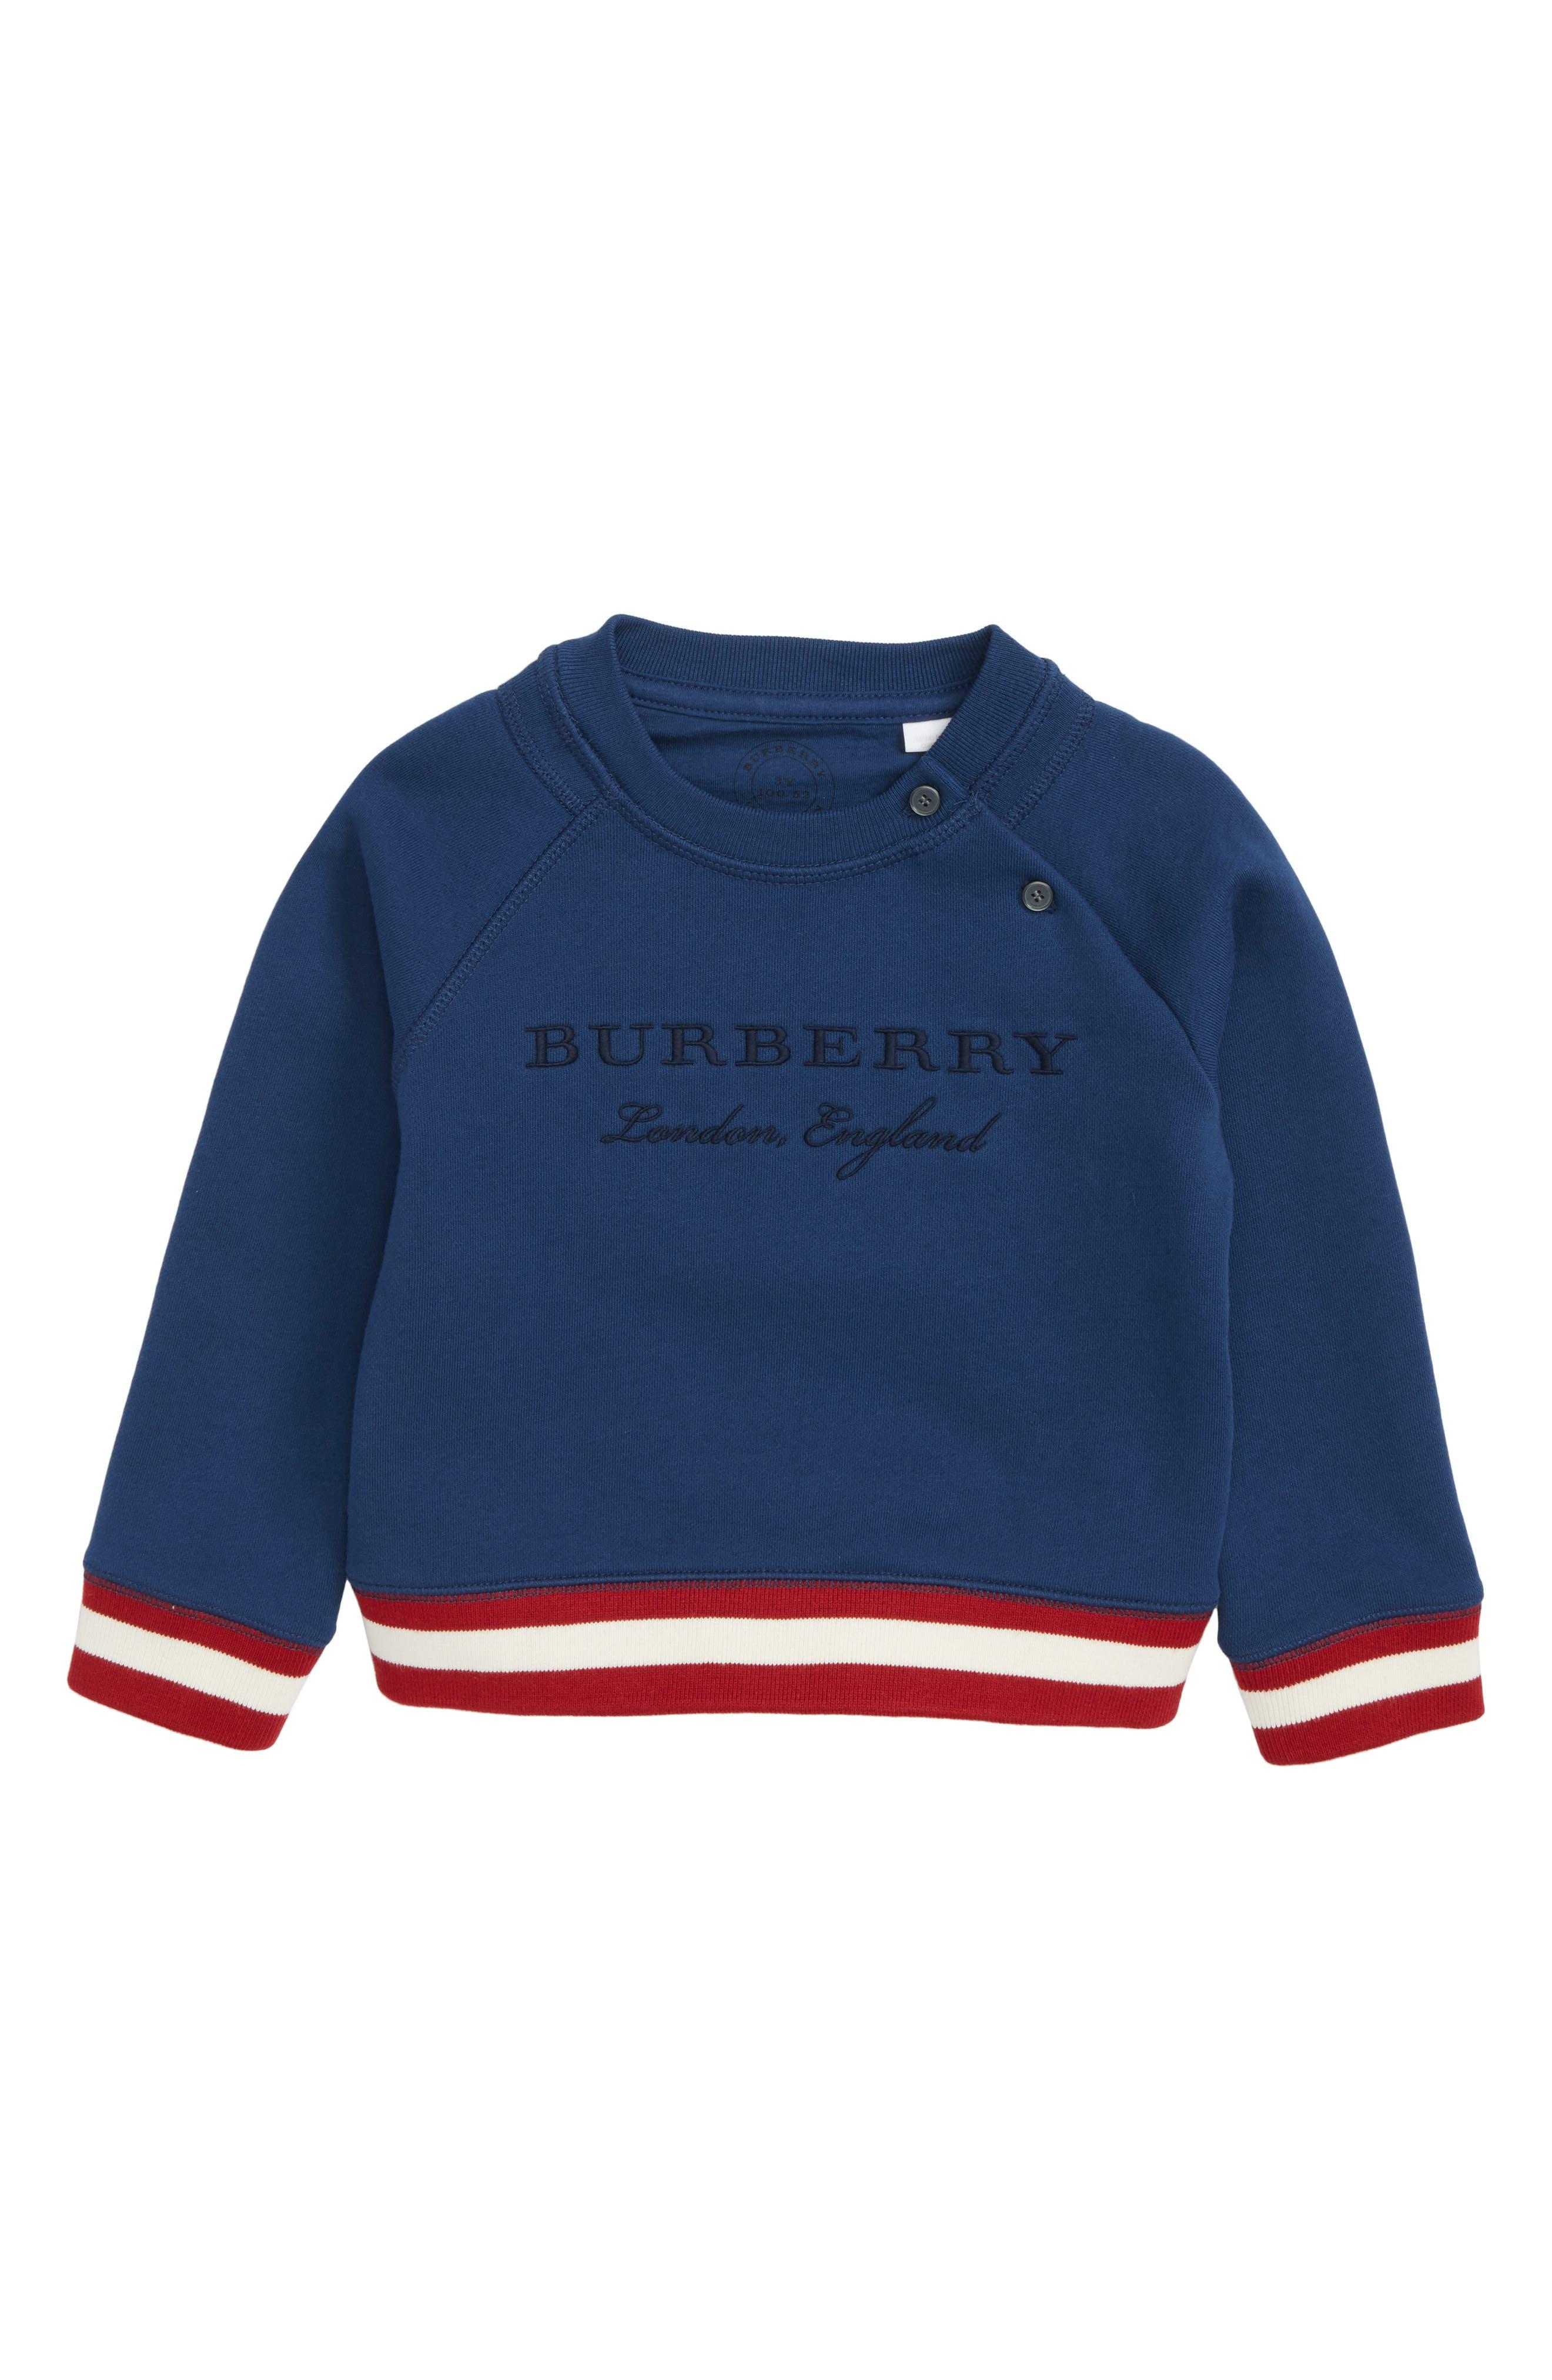 Main Image - Burberry Stanley Jersey Sweatshirt (Toddler Boys)